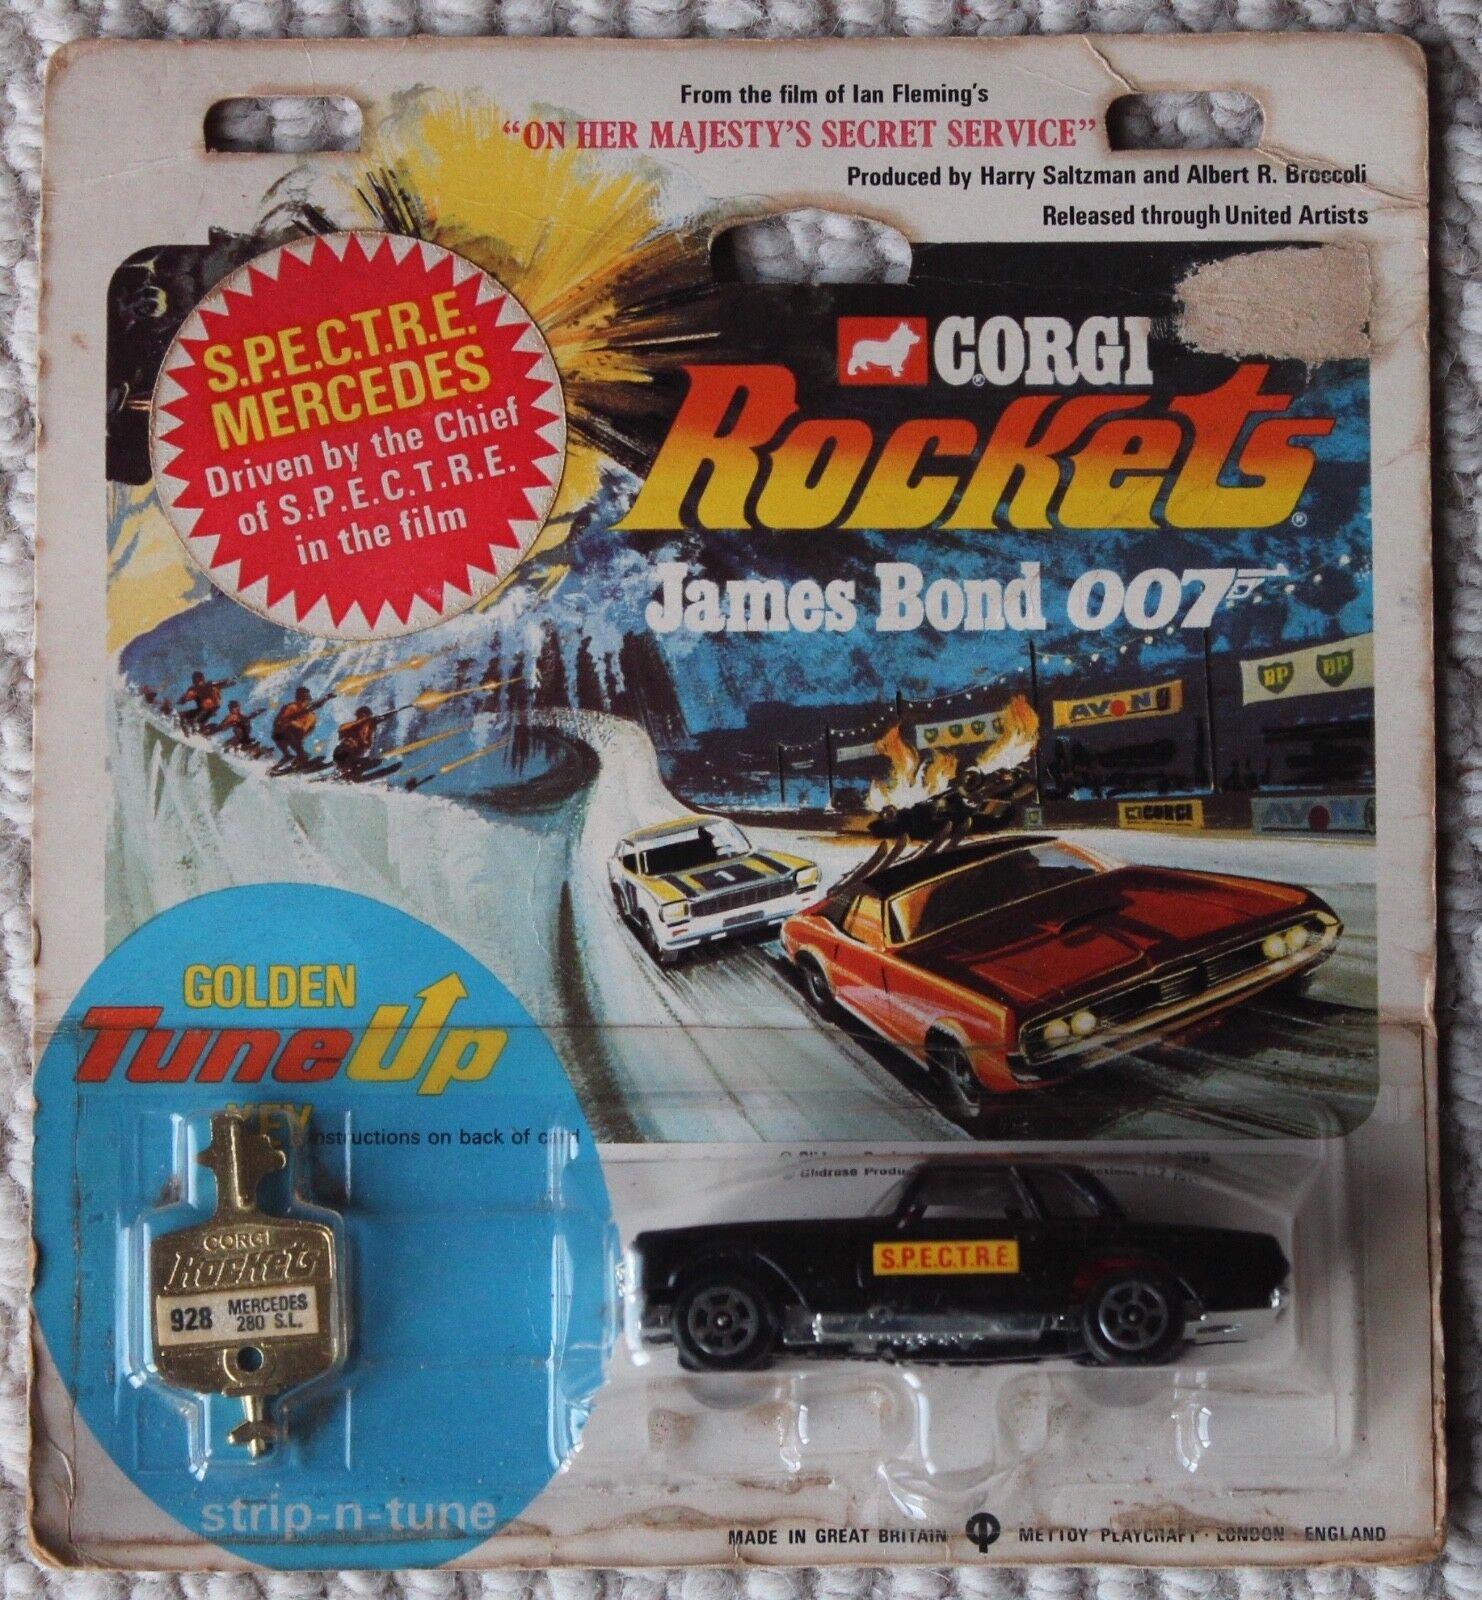 Corgi cohetes James Bond Mercedes OHMSS 928 Spectre Mercedes Coche Mettoy